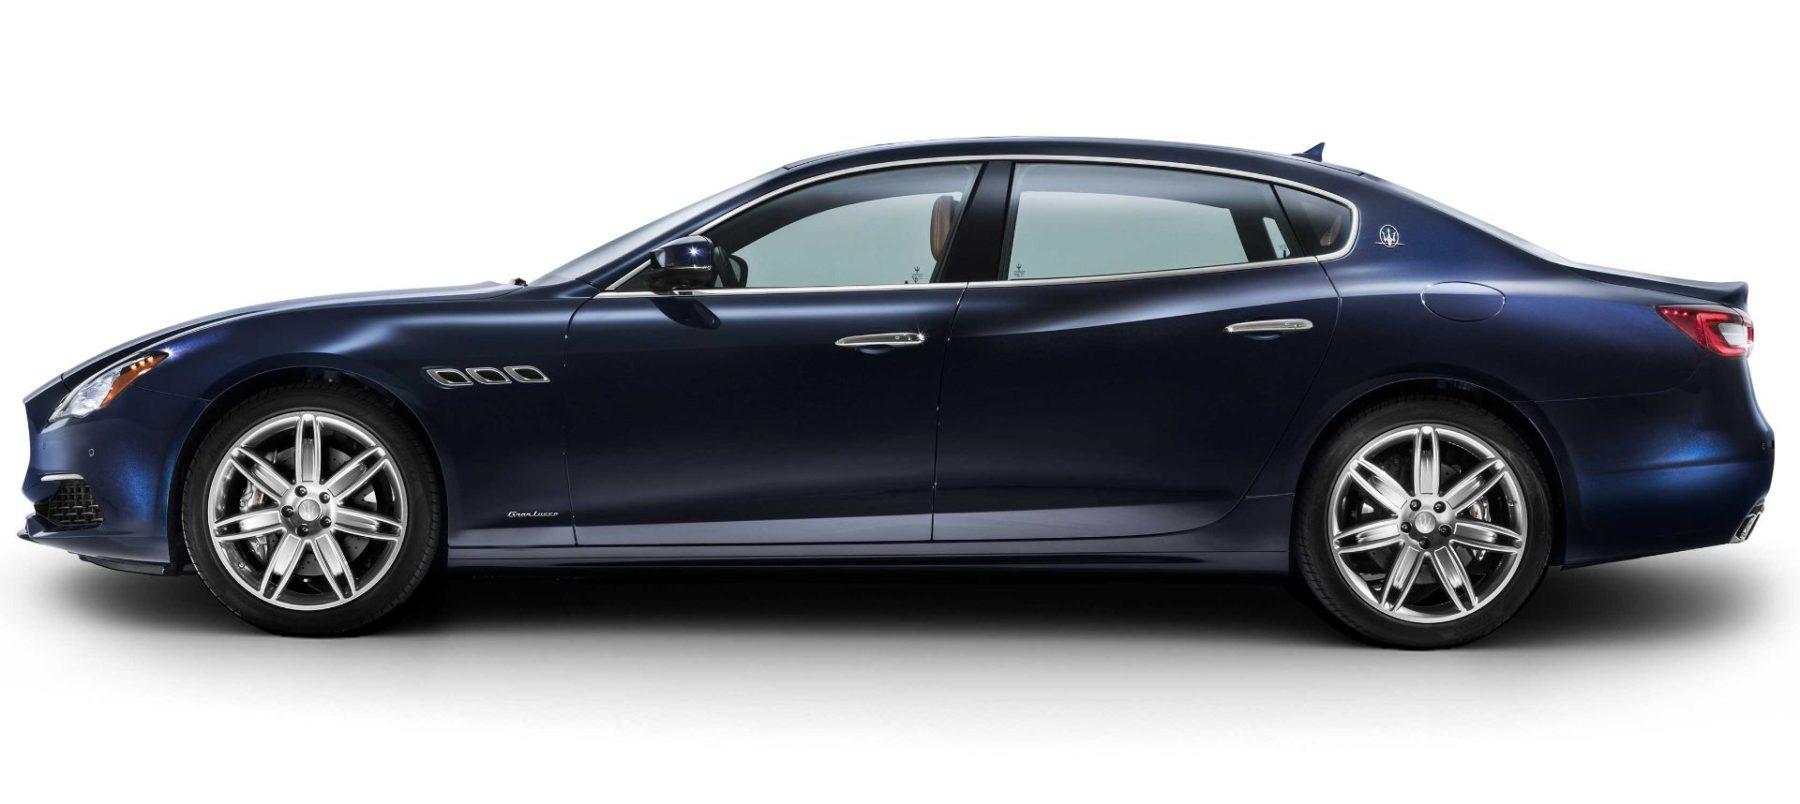 Maserati Quattroporte 2017, el arte de seducir